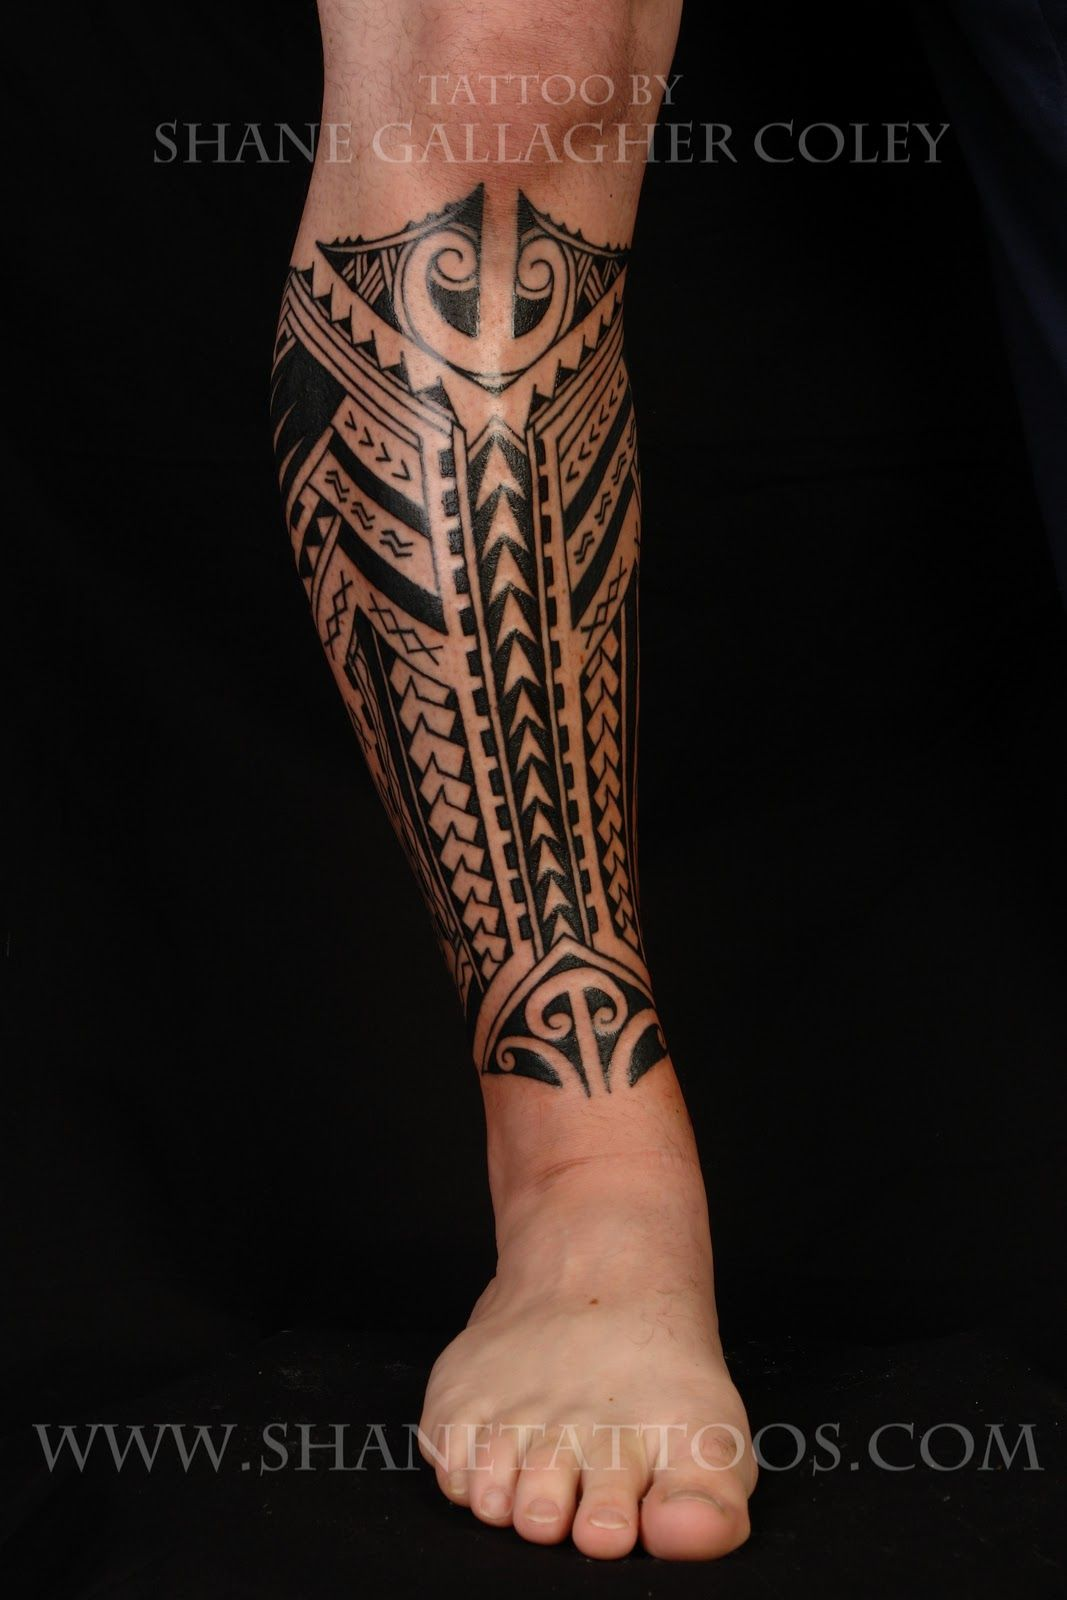 Shane Tattoos Polynesian Samoan Calf Tattoo Polynesian Leg Tattoo Leg Tattoos Samoan Tattoo